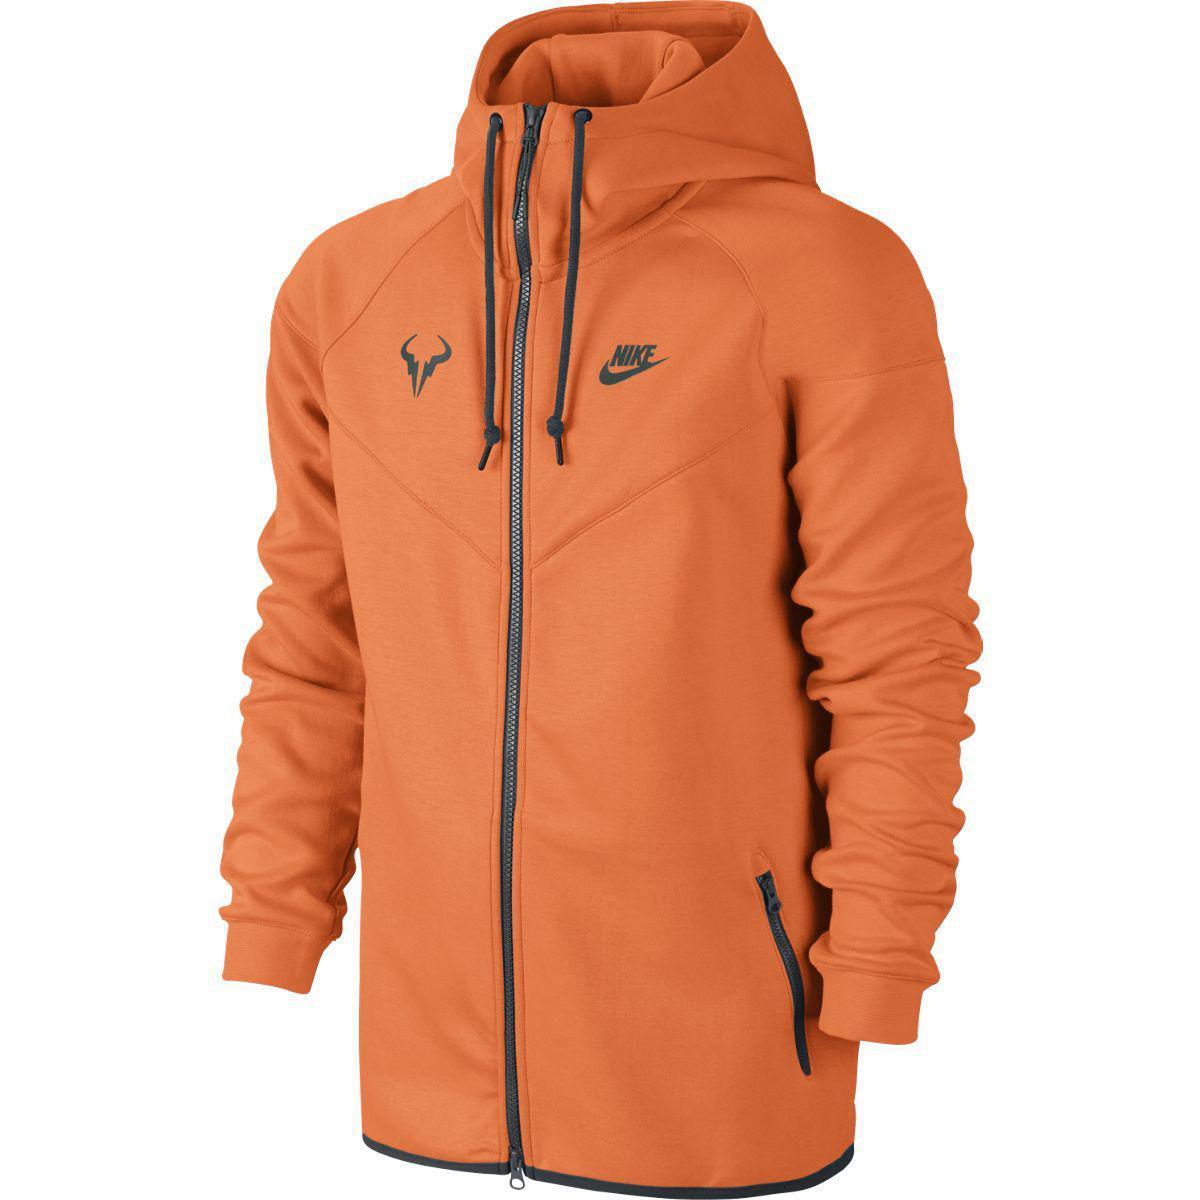 4c45189ee470 Nike Mens Premier Rafa Jacket - Orange Glow - Tennisnuts.com